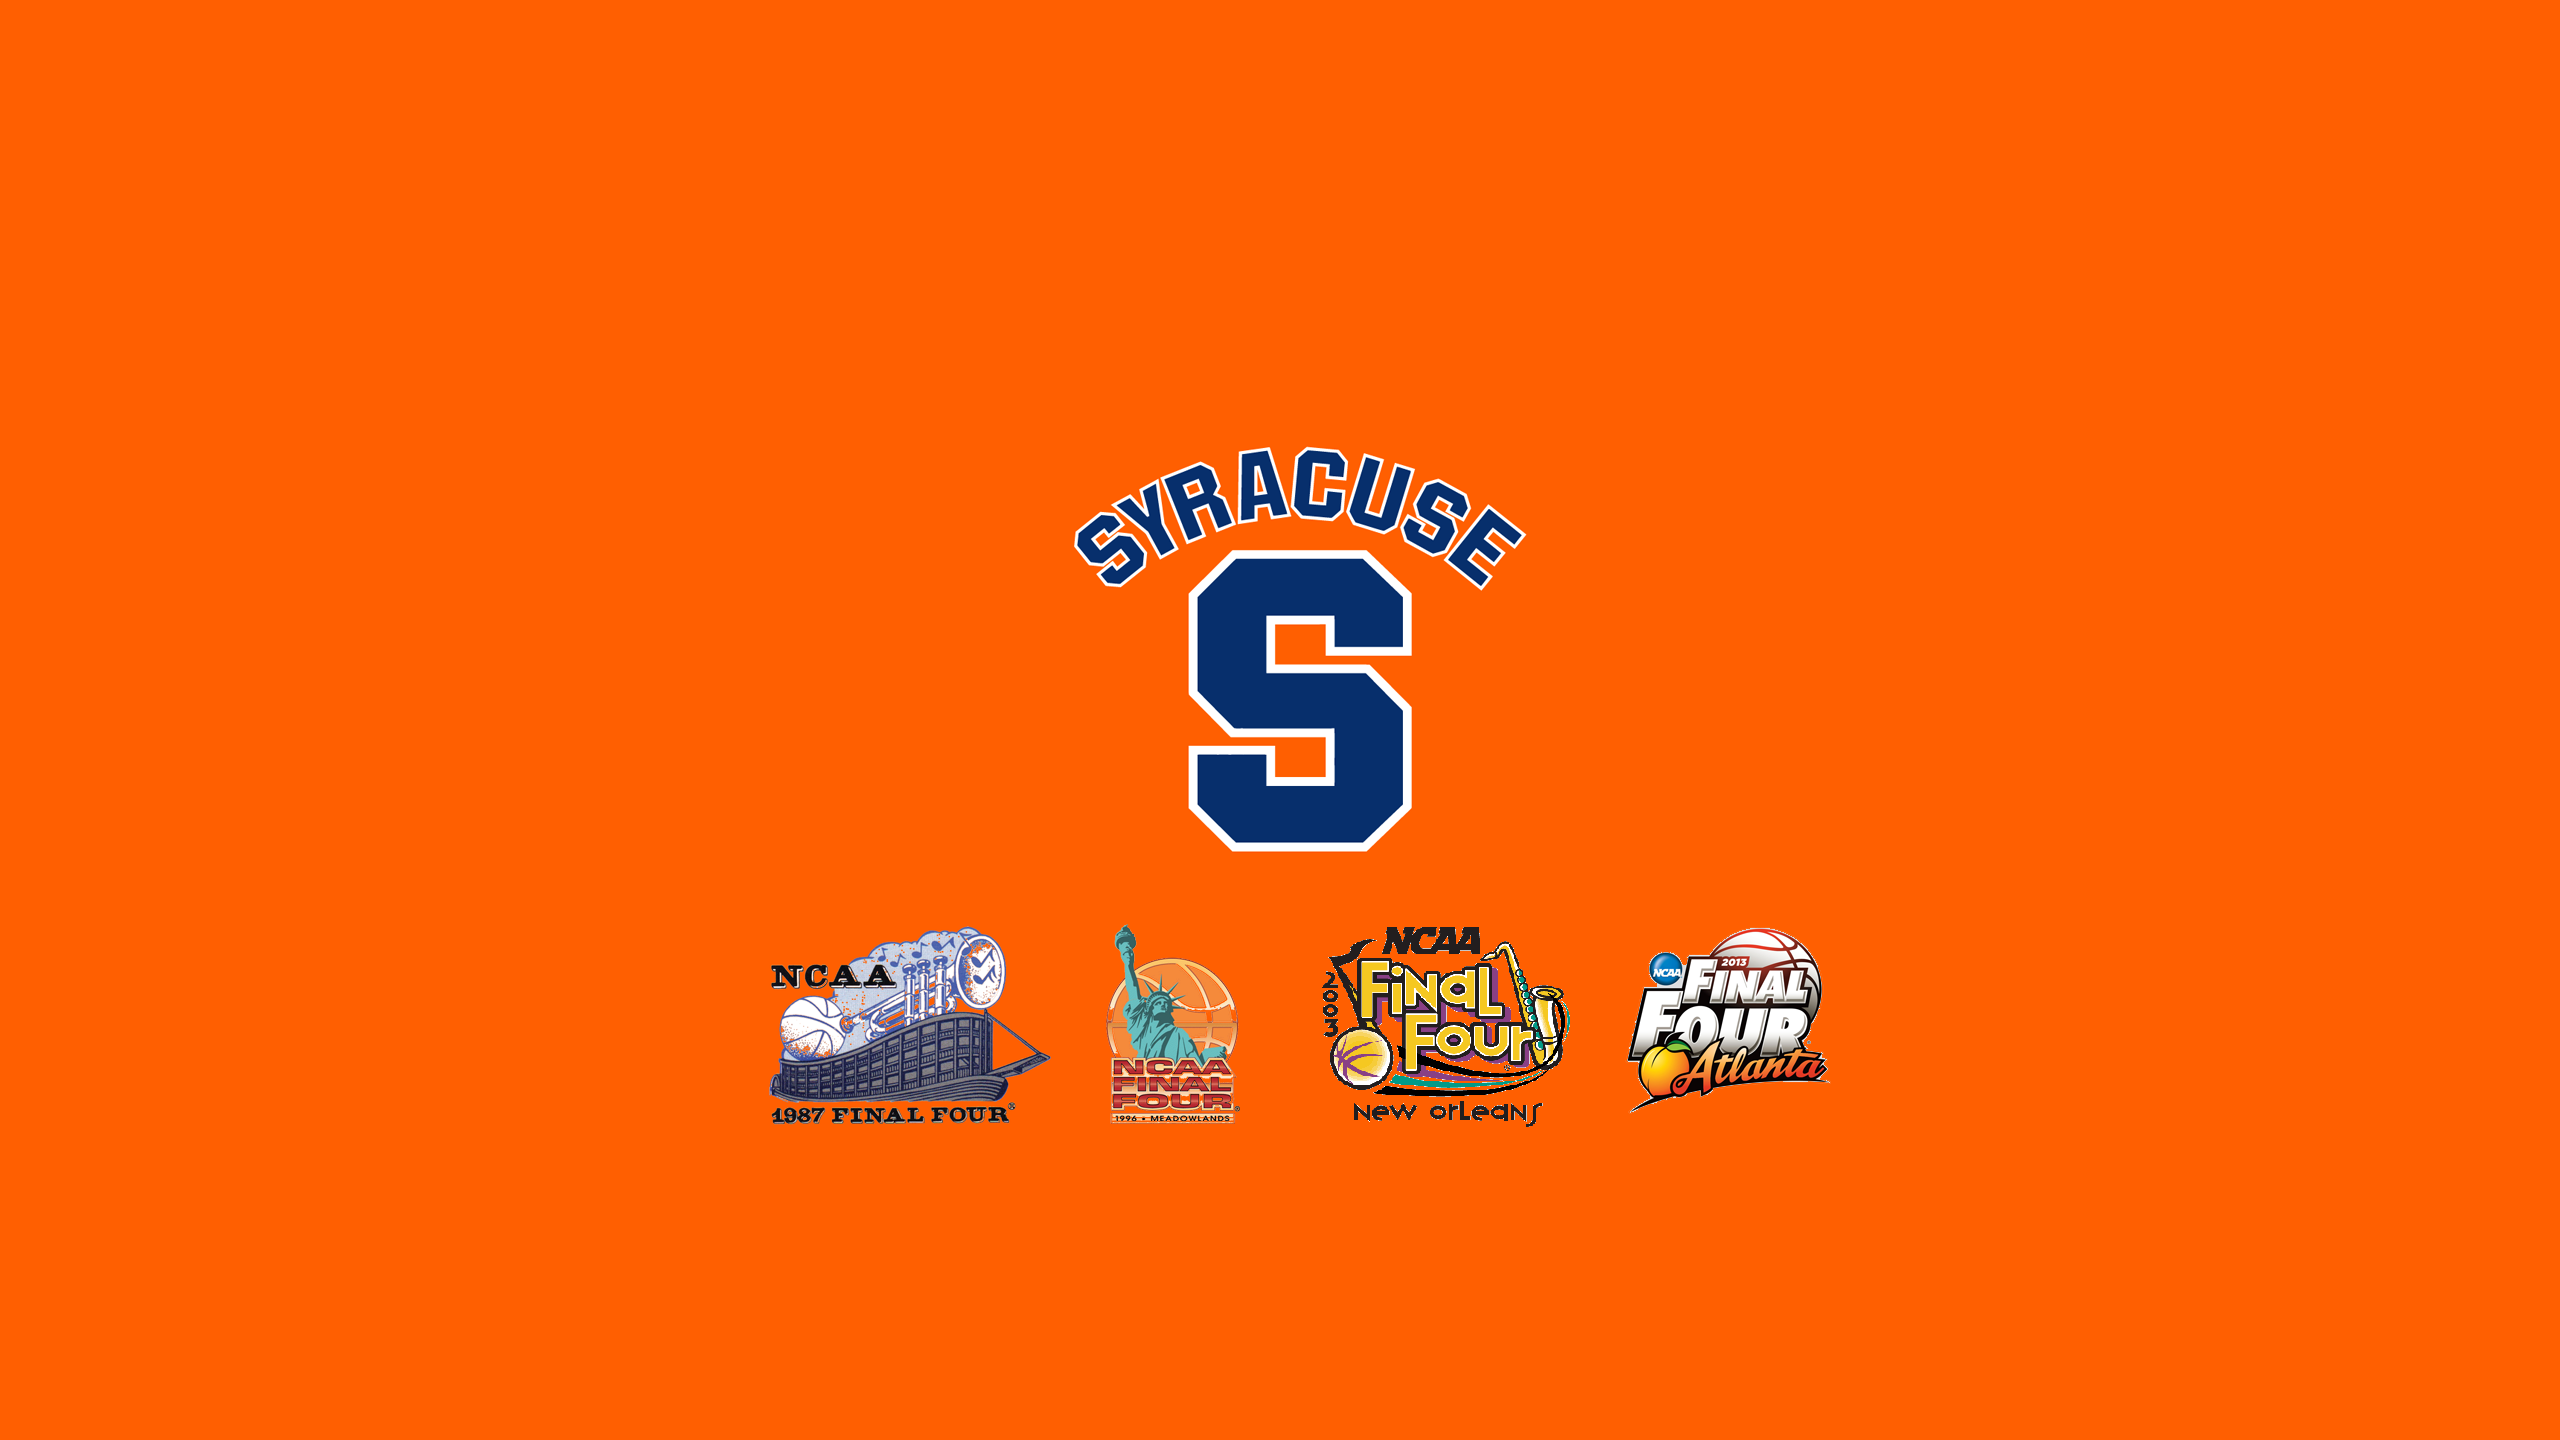 Syracuse Logo Wallpaper 2560x1440